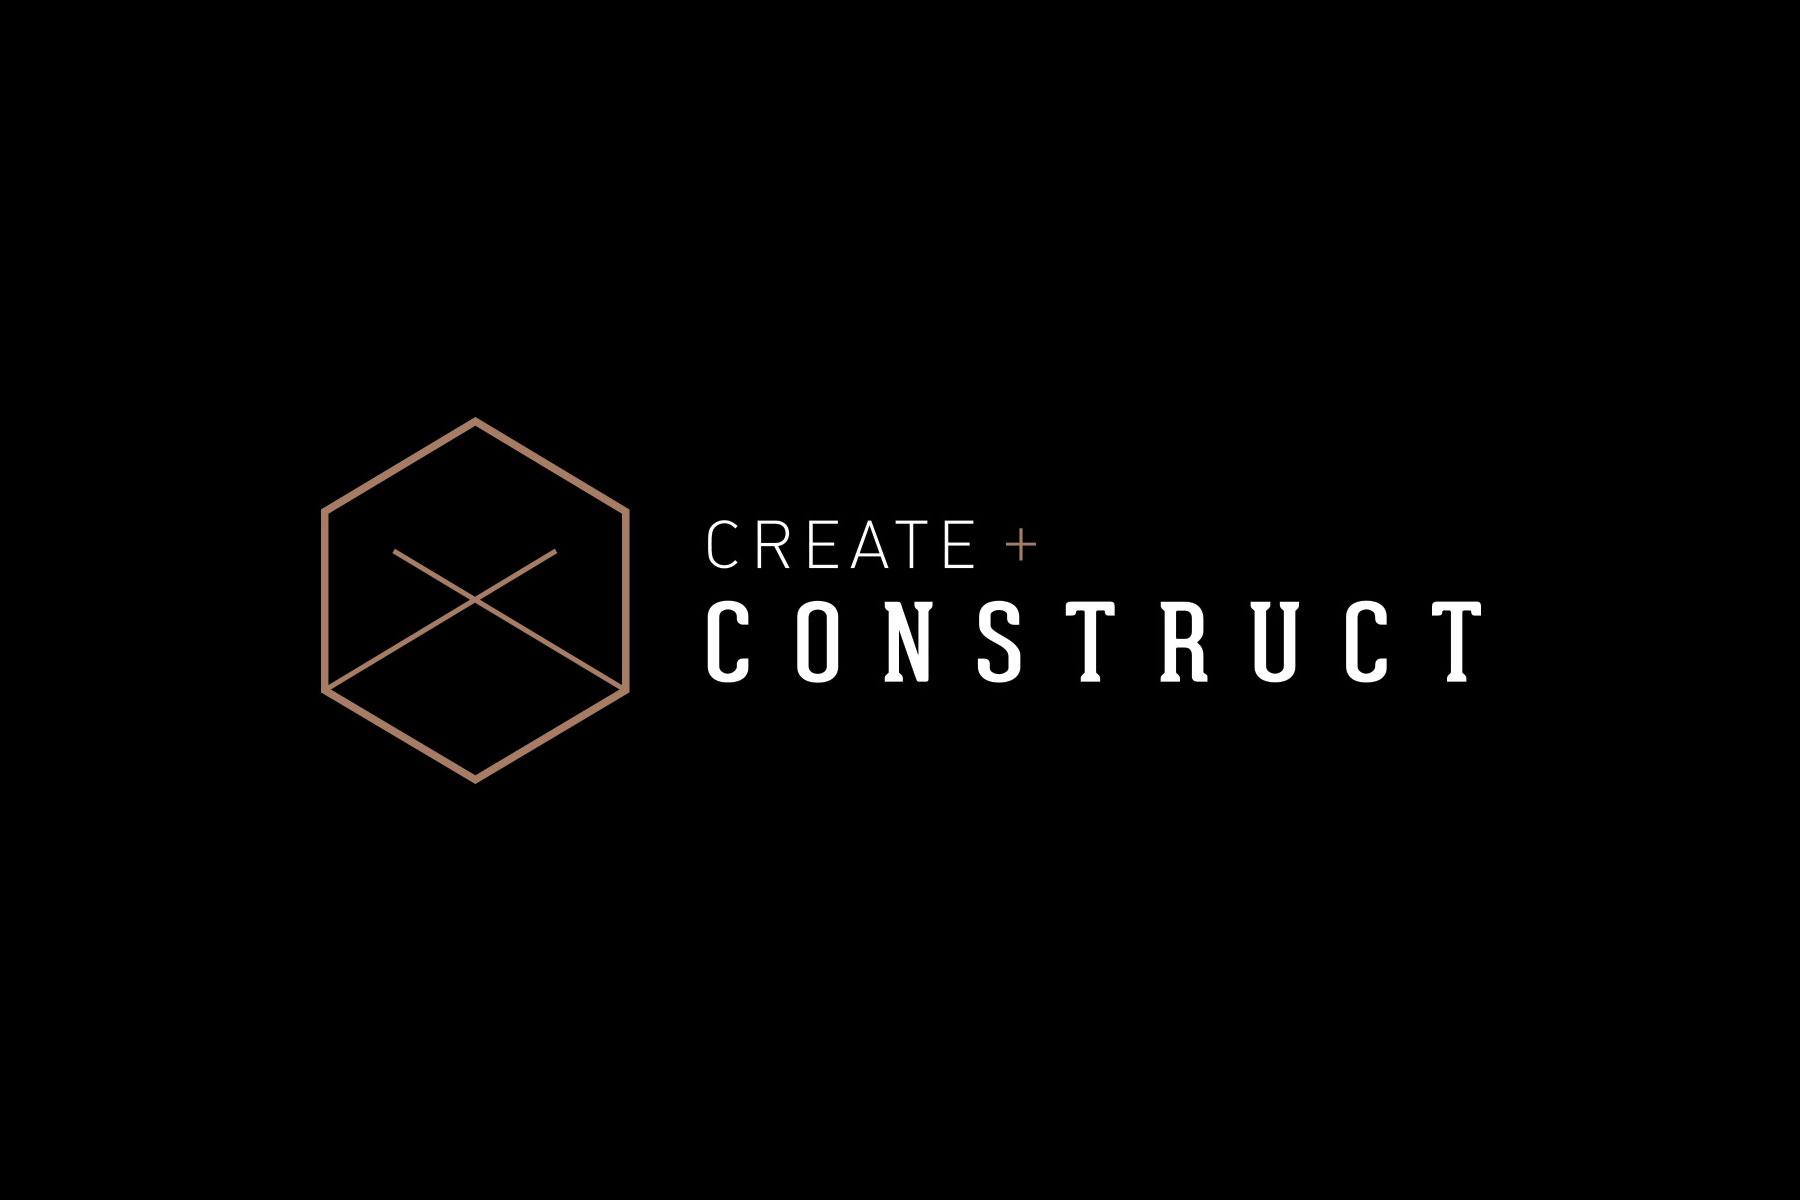 create-construct001